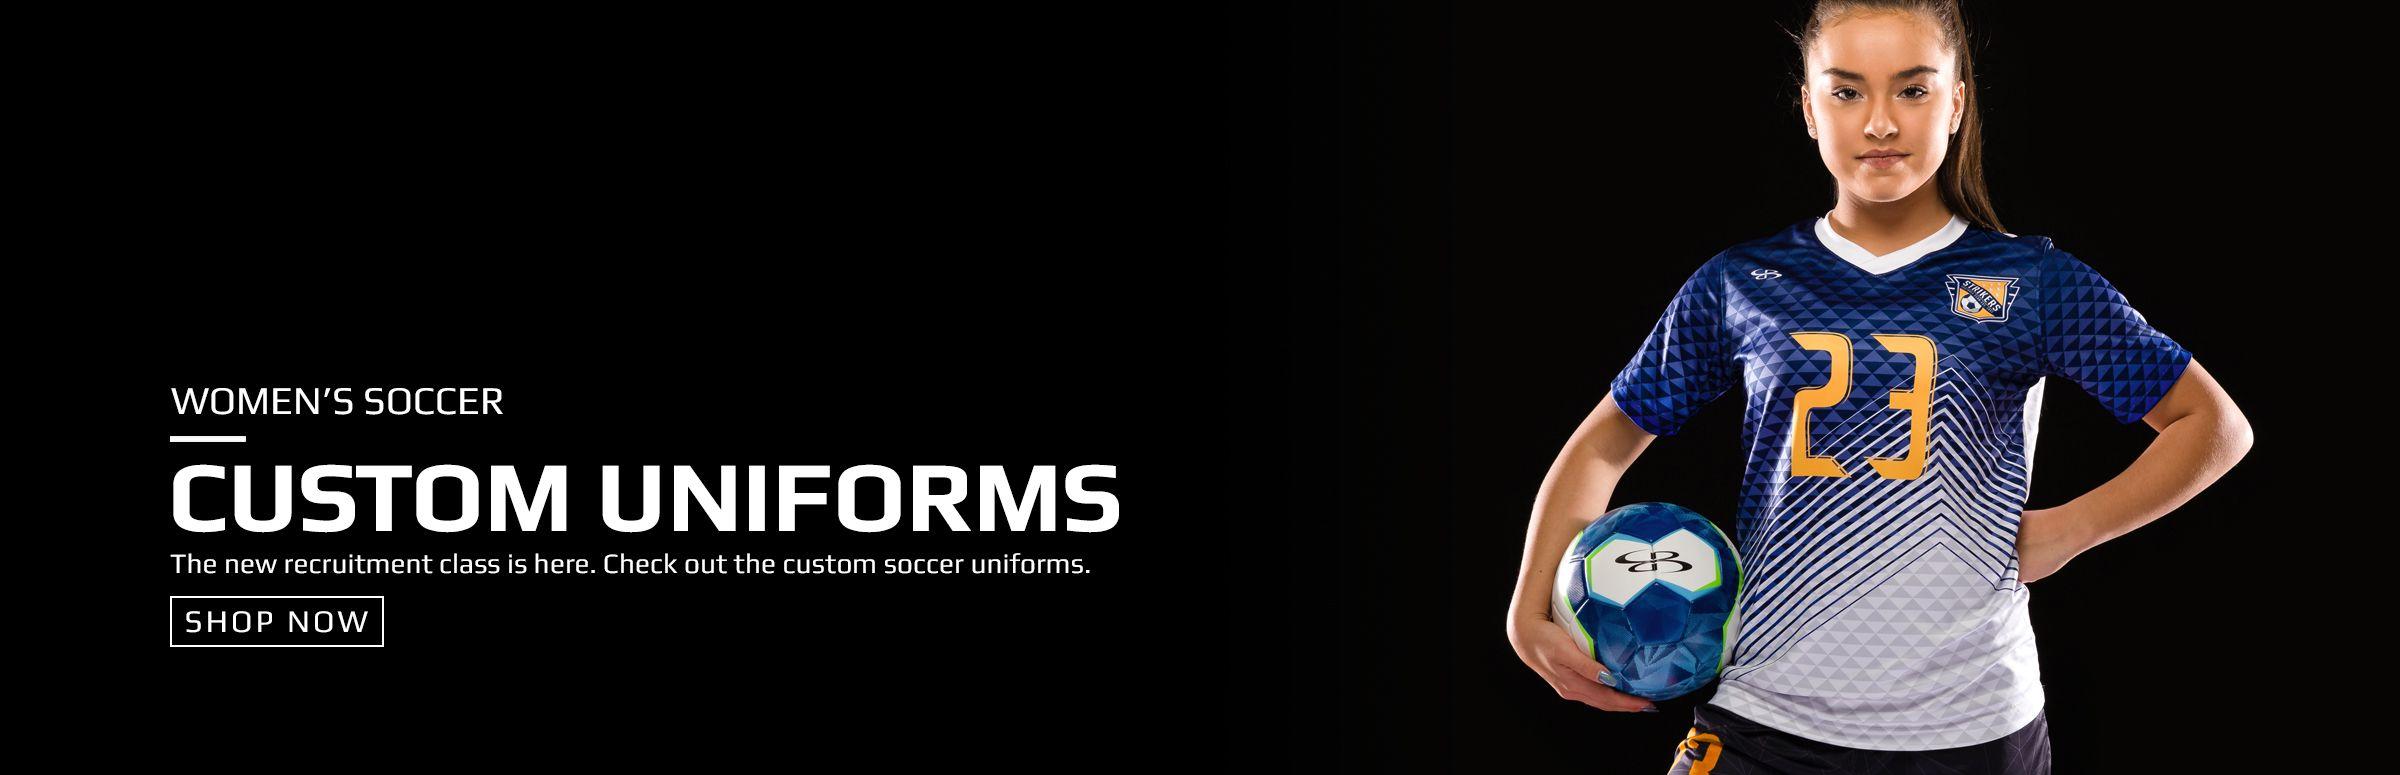 Boombah Custom Soccer Uniforms